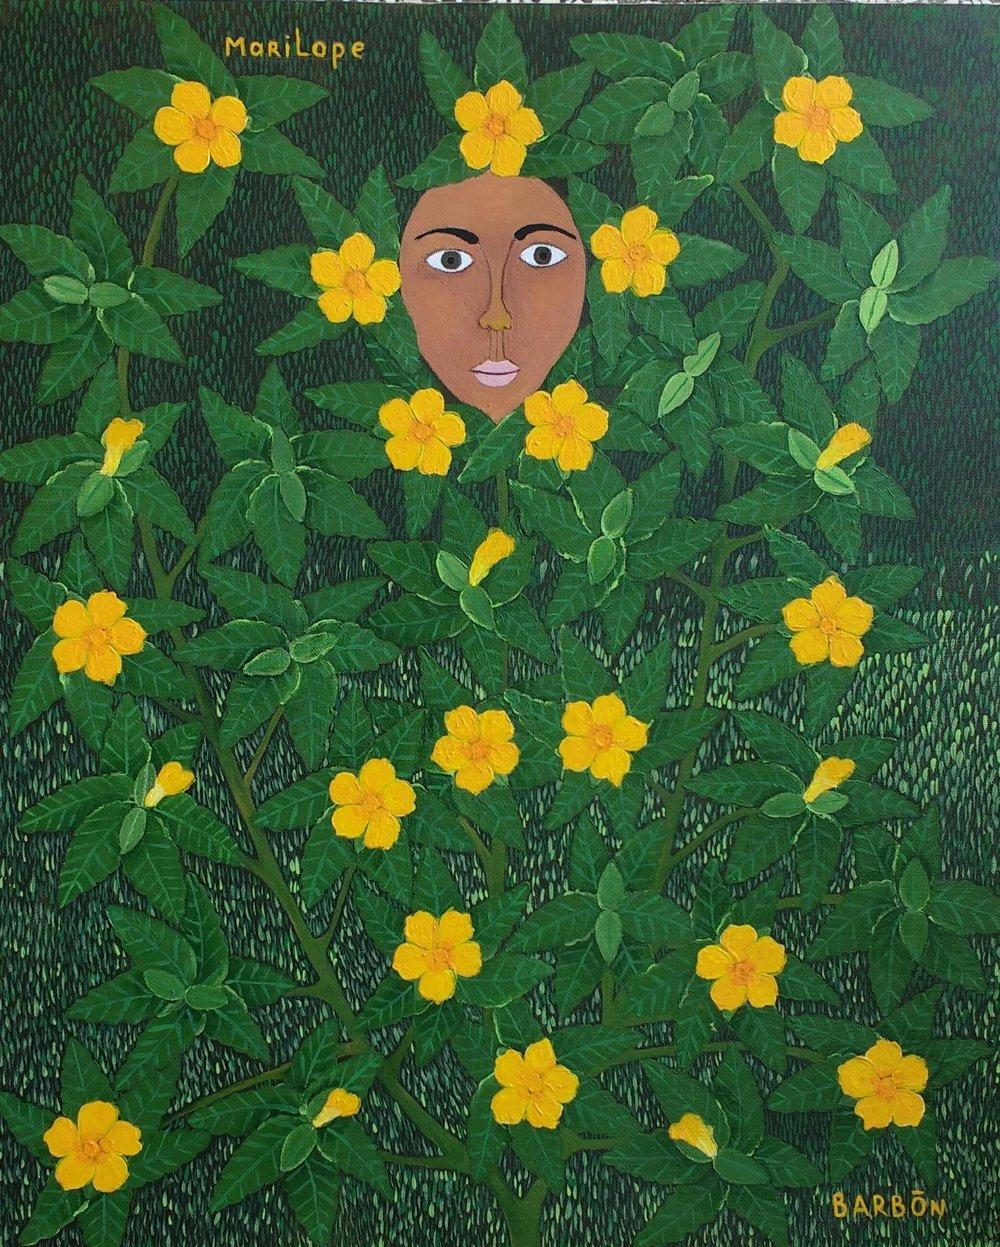 Julio Barbon-Marilope-2016-Acrylic on Canvas-22 x 18 inches.jpg